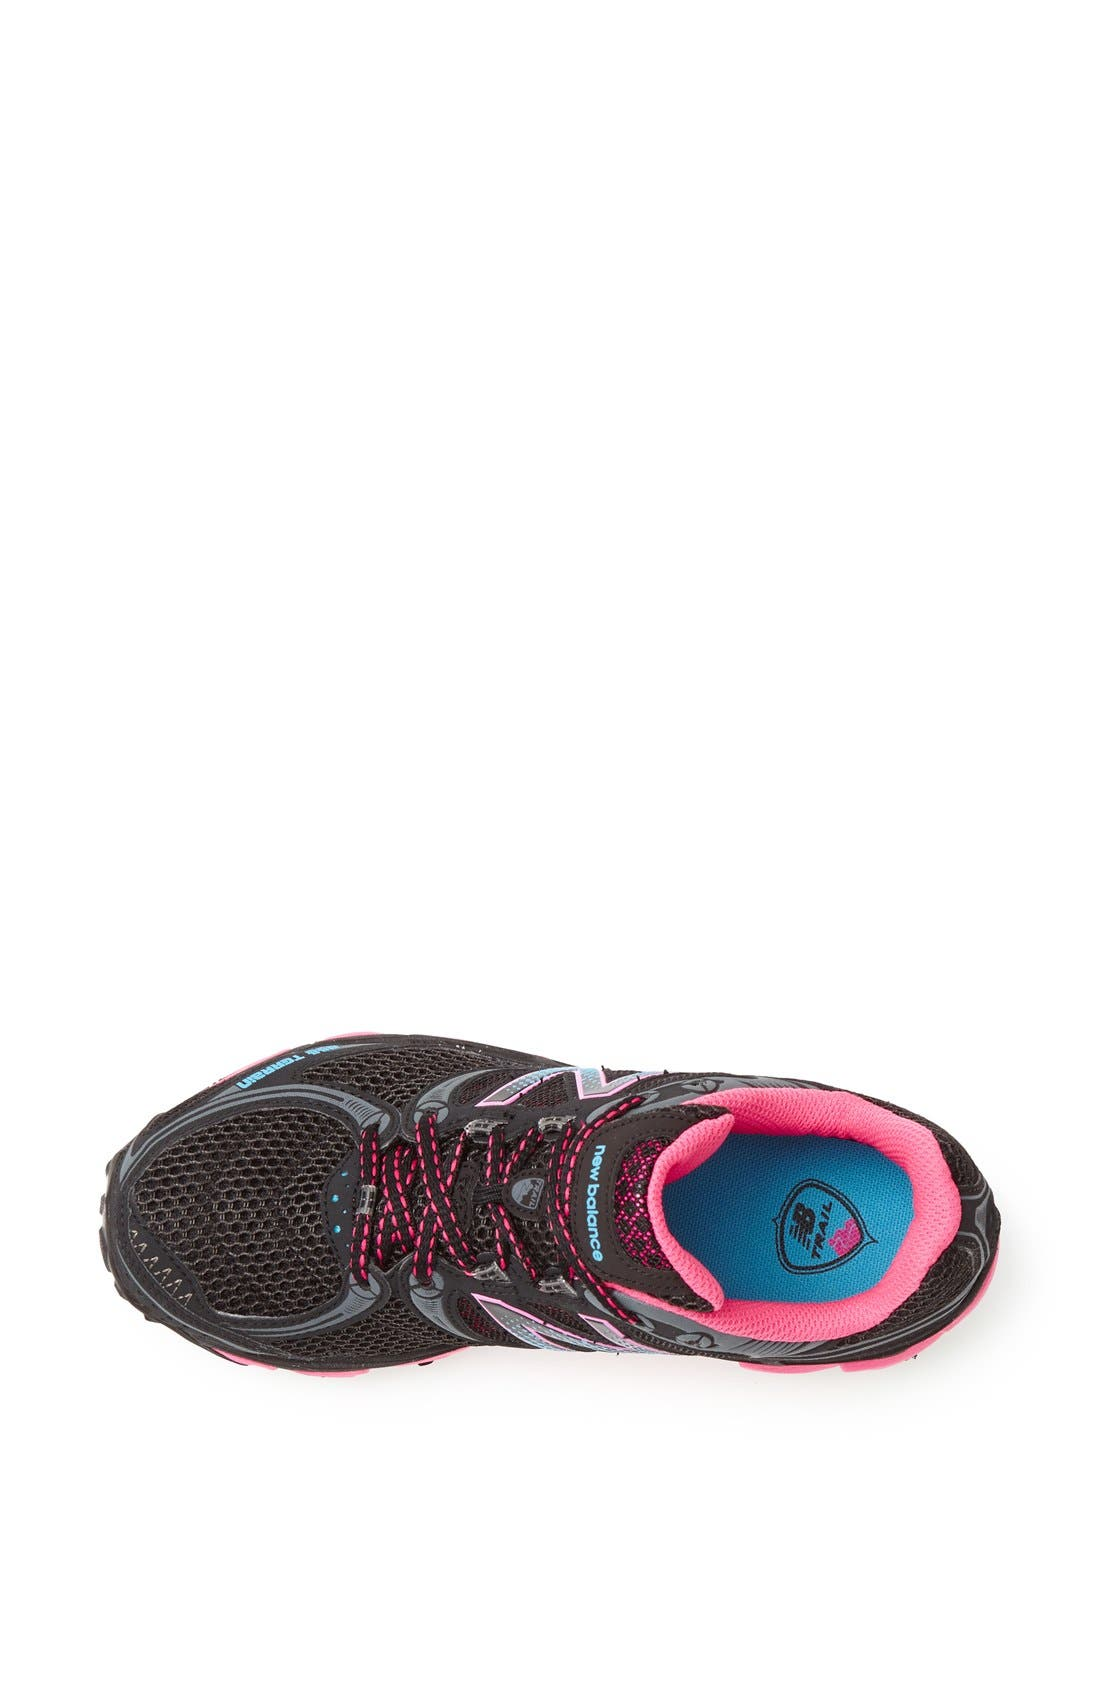 '810' Trail Running Shoe,                             Alternate thumbnail 4, color,                             018